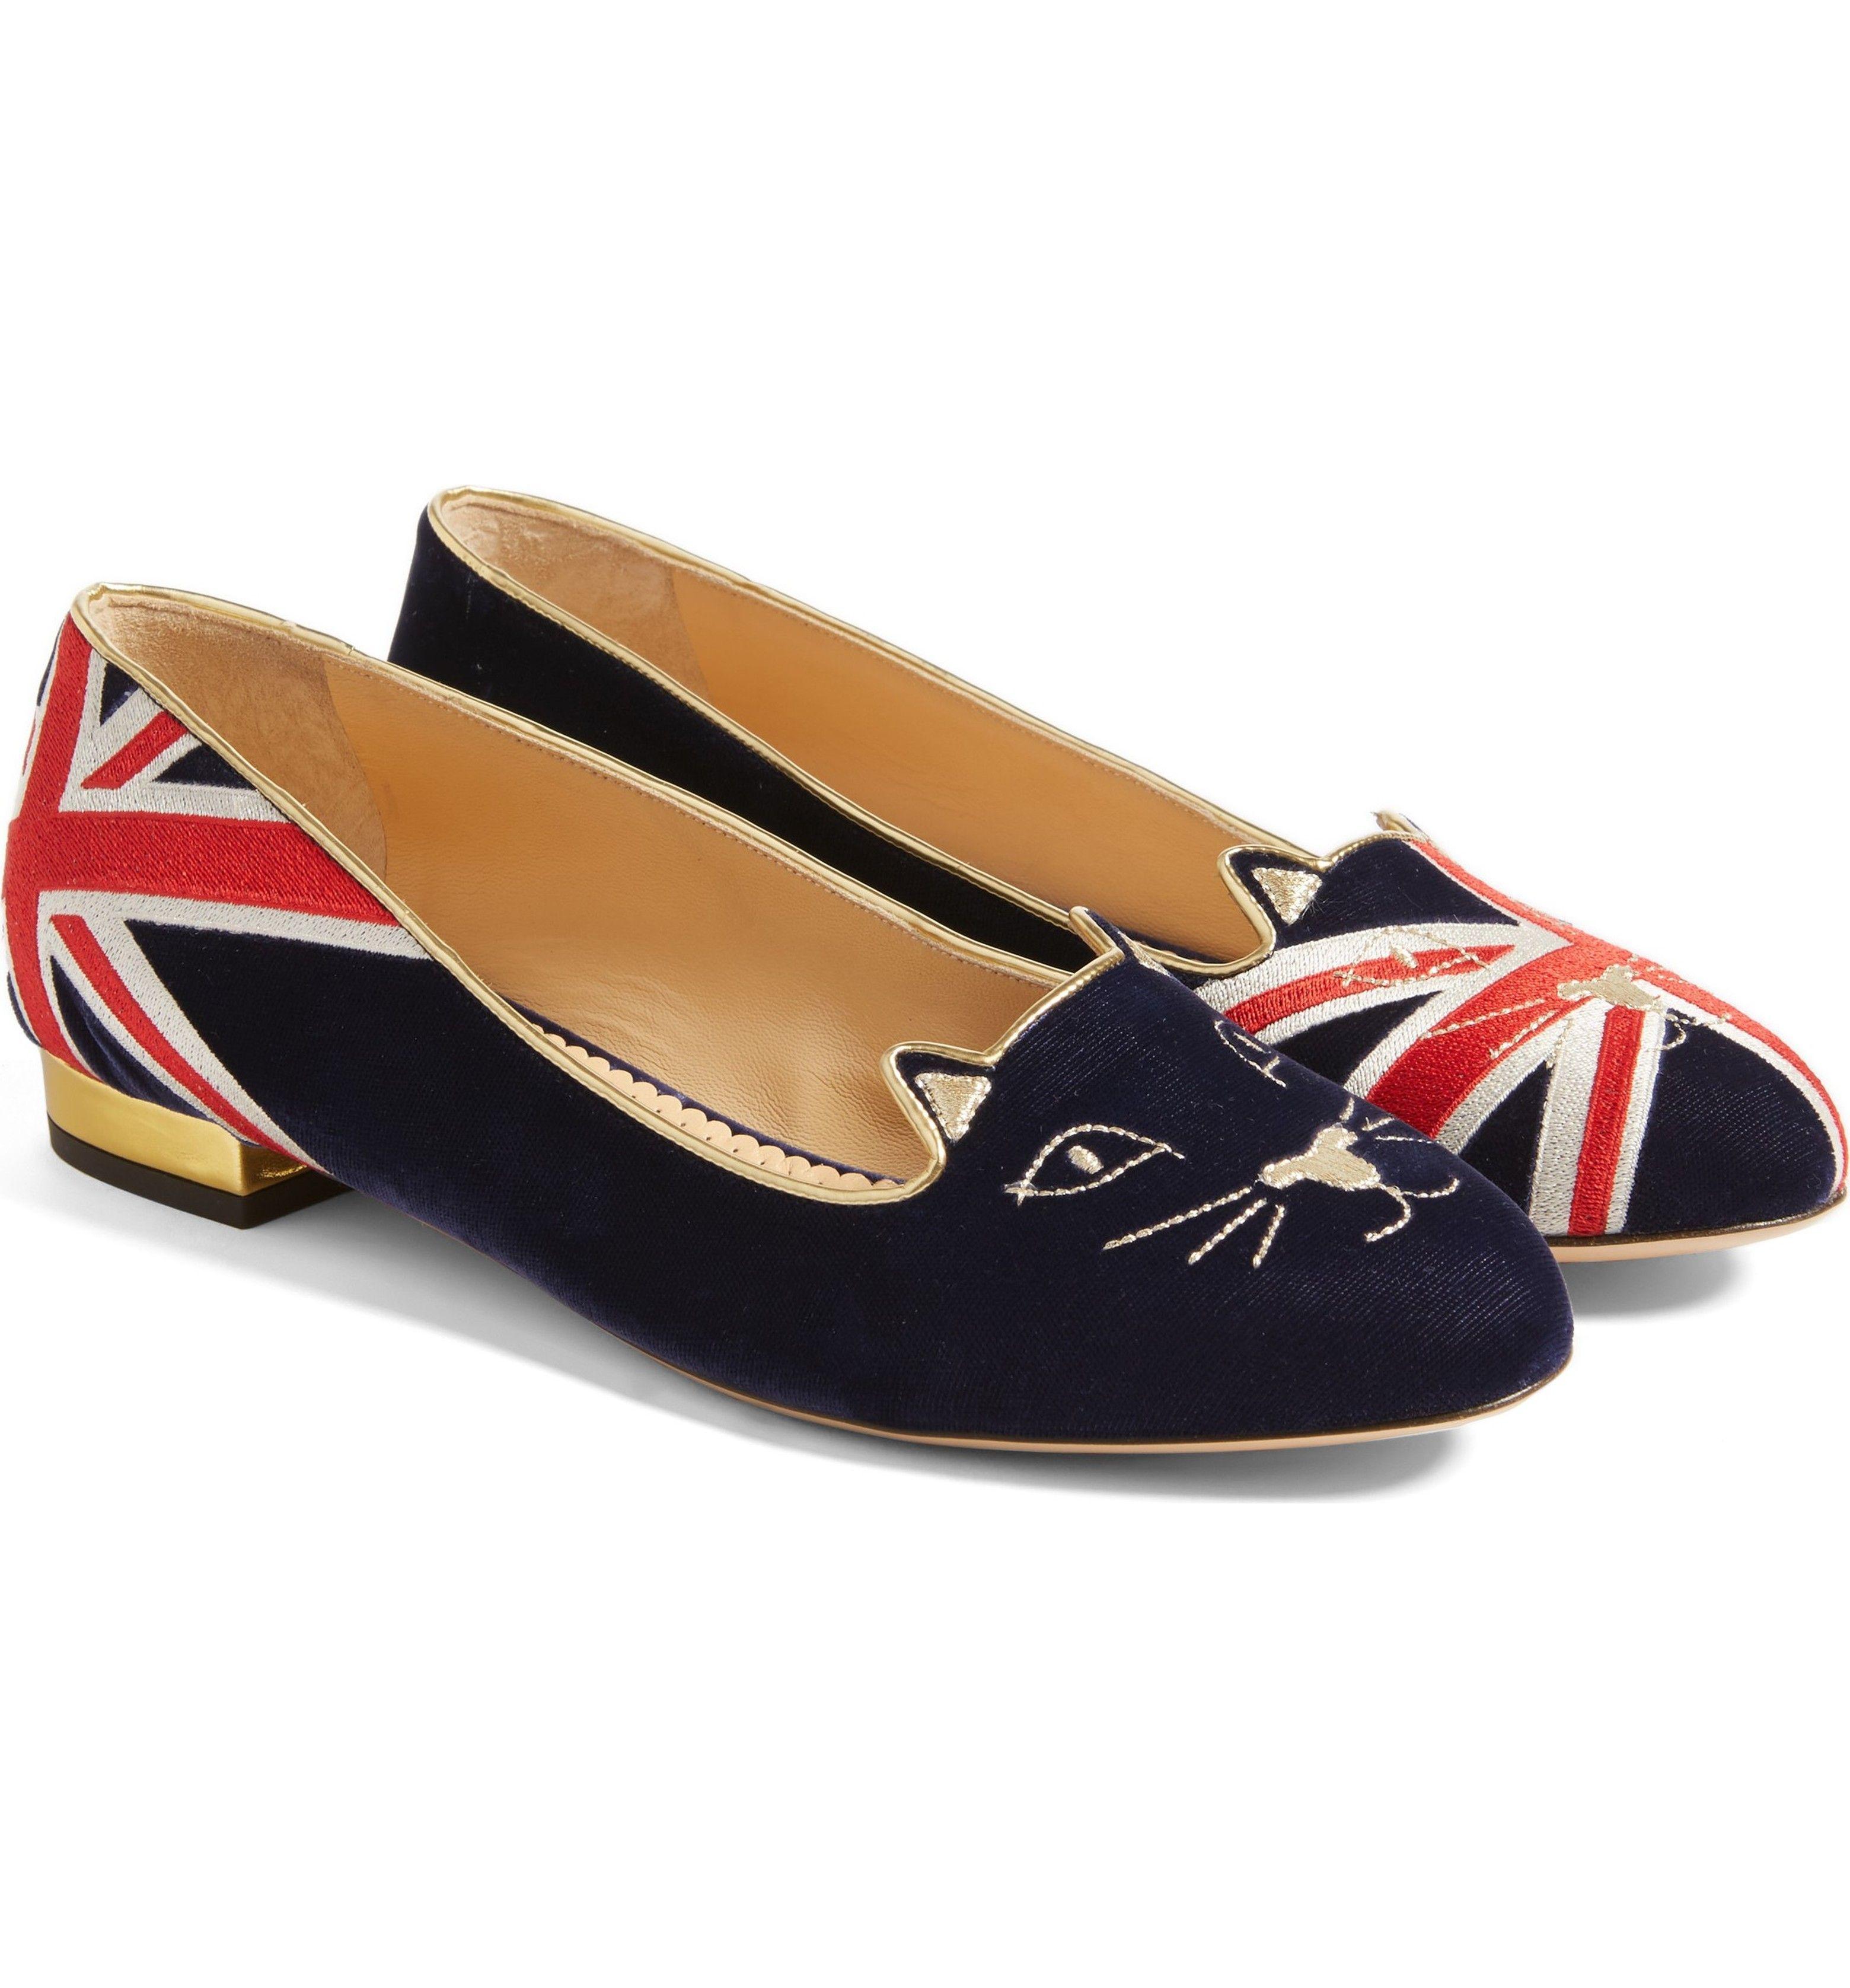 6c00e2208656 Main Image - Charlotte Olympia Great Britain Kitty Flat (Women ...